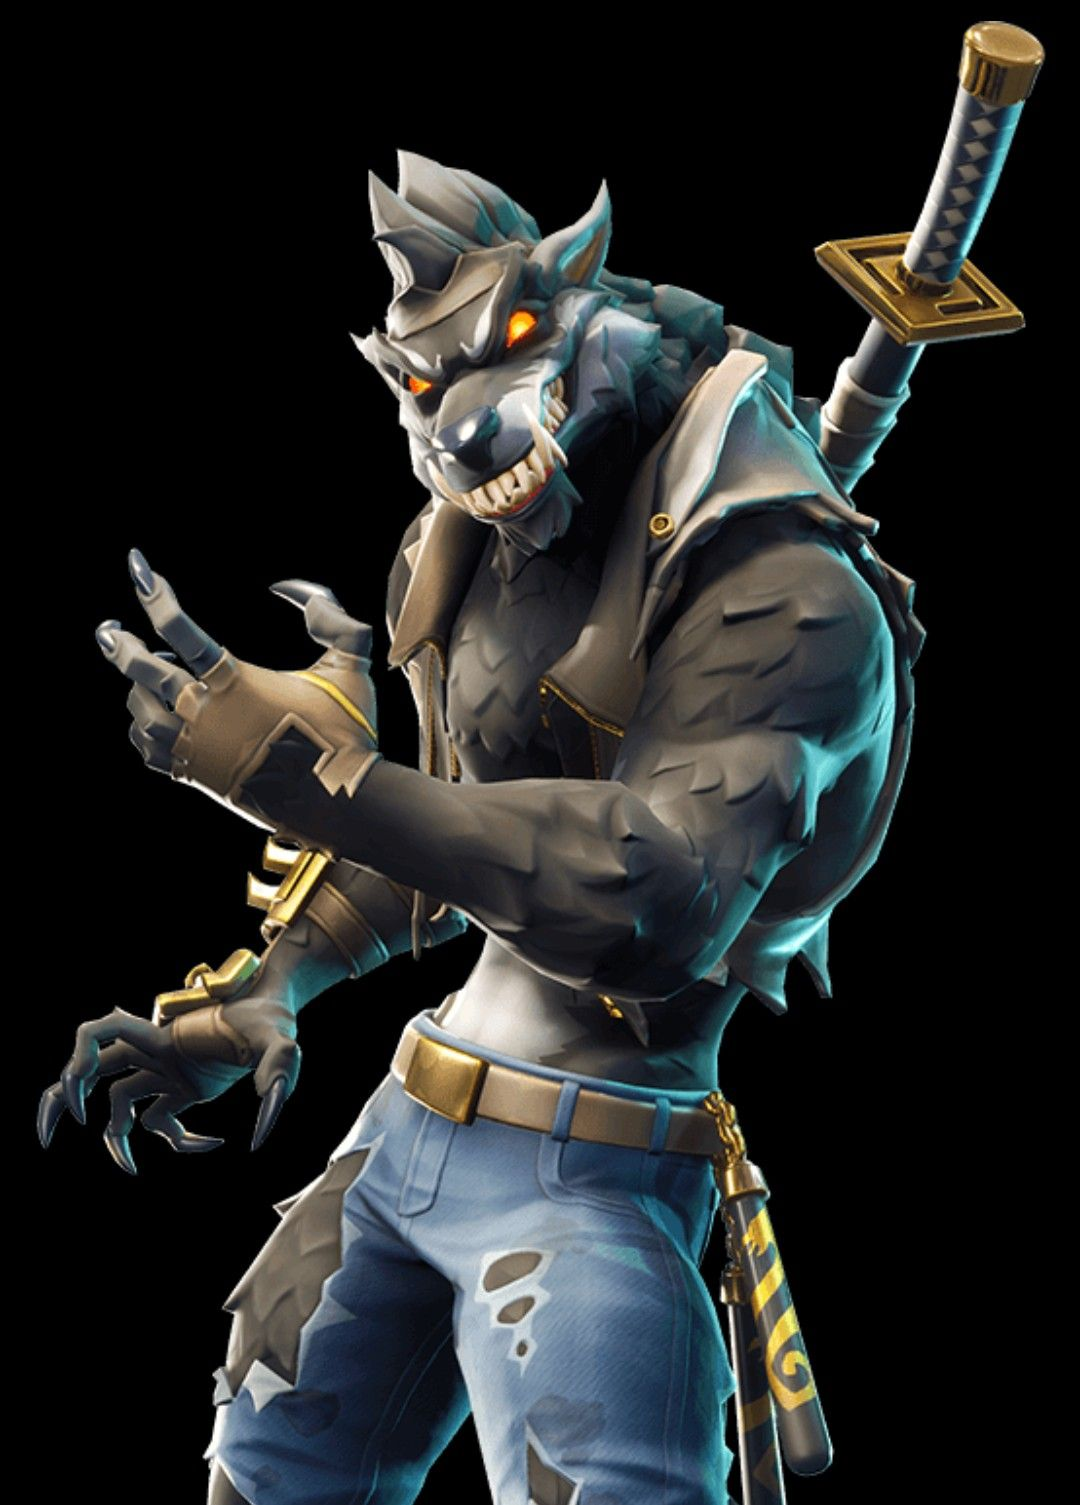 Fortnite Werewolf Bestia En 2019 Dessin Personnage